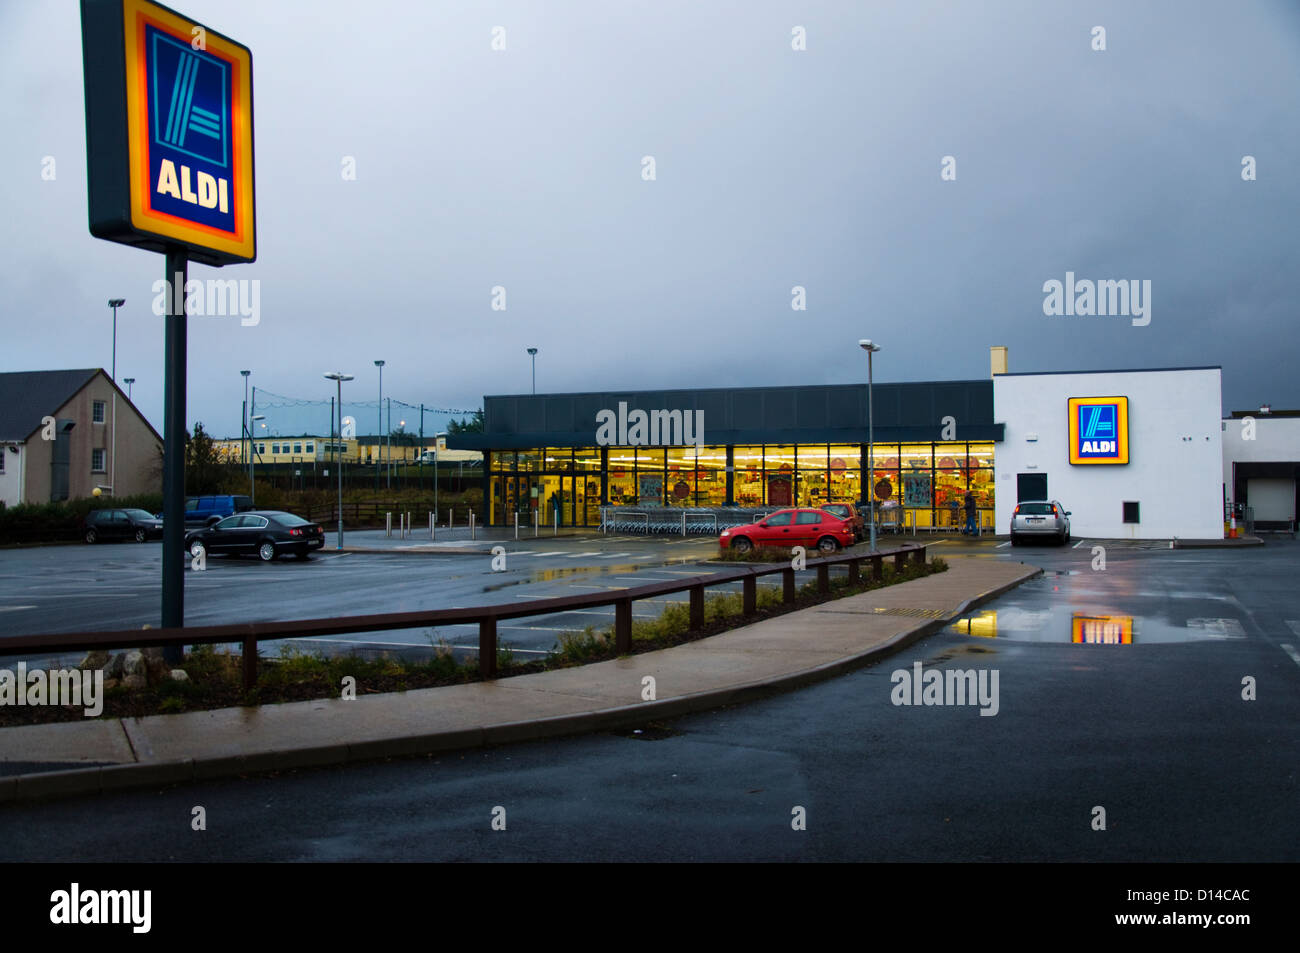 Aldi store shop carpark in Dungloe Ireland - Stock Image